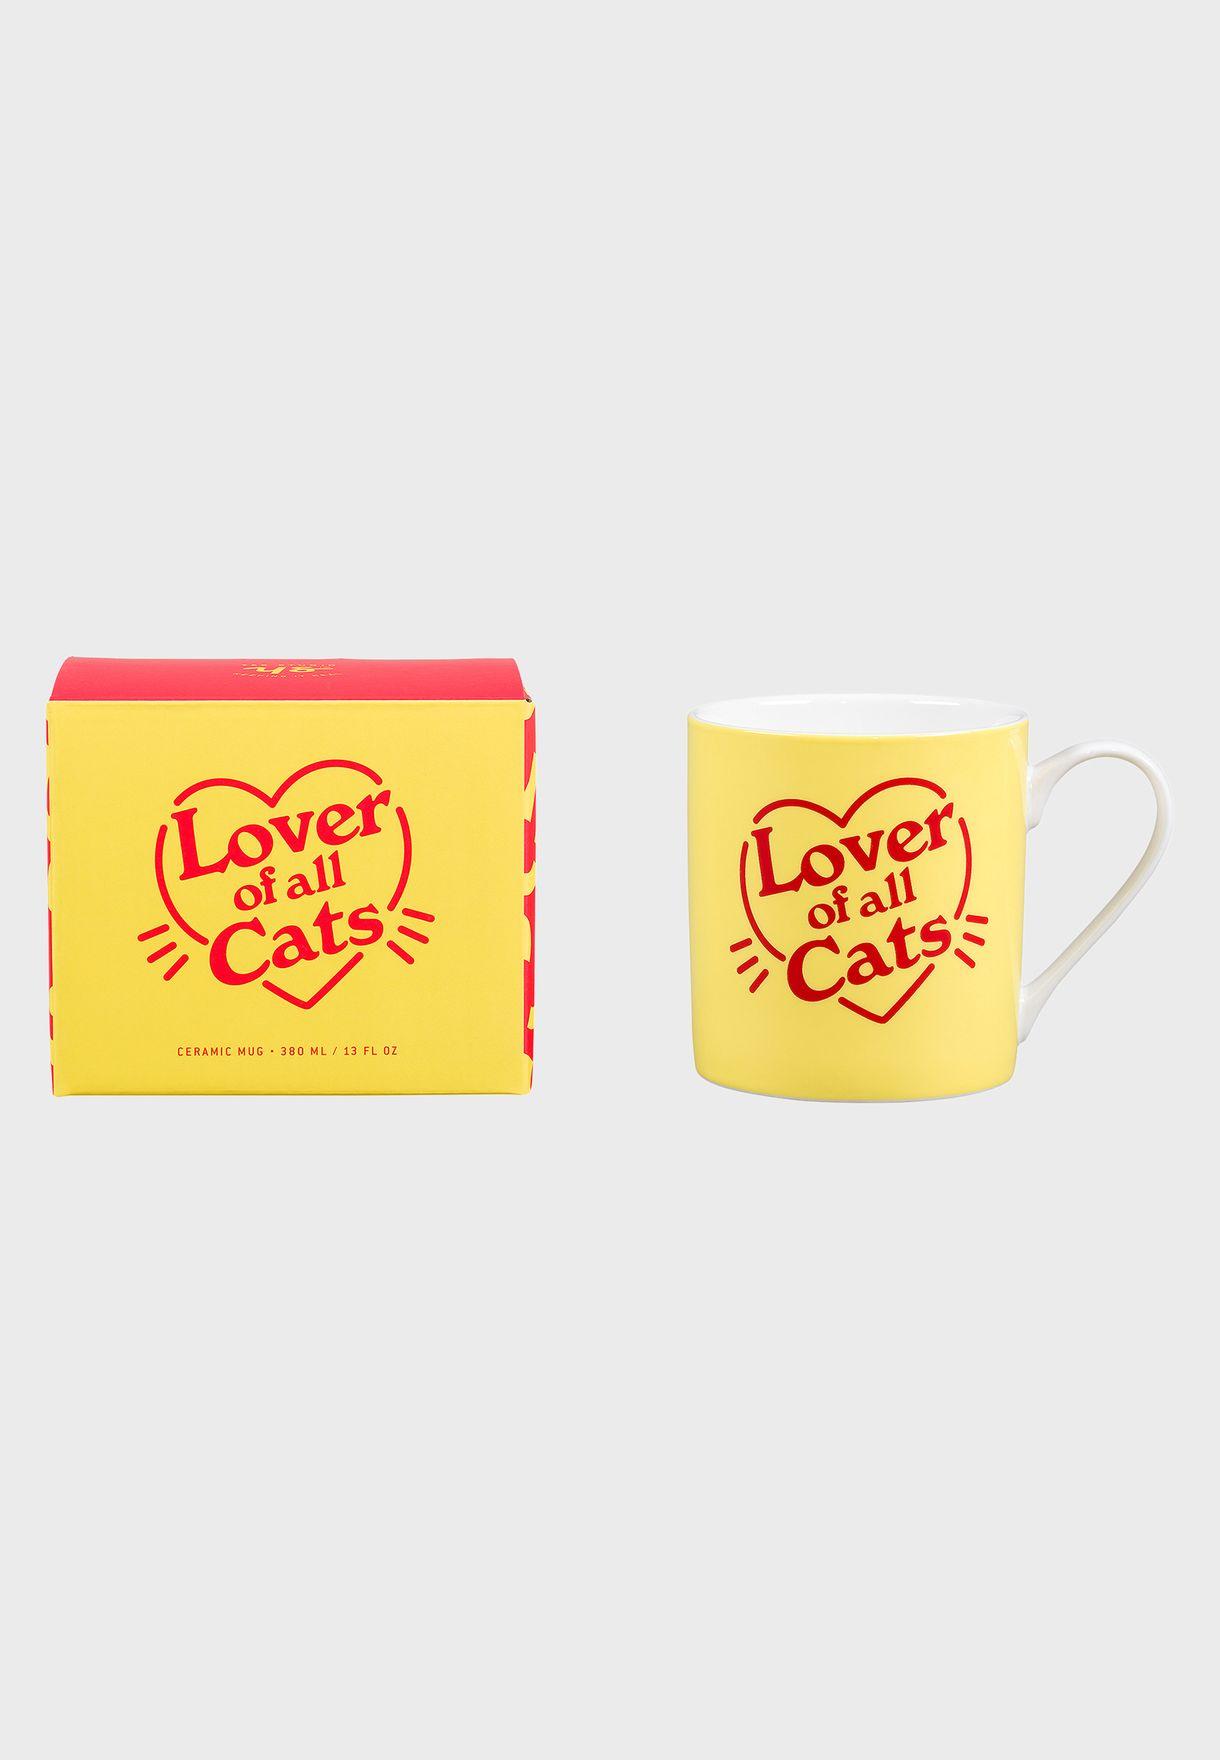 Love Of All Cat's Ceramic Mug